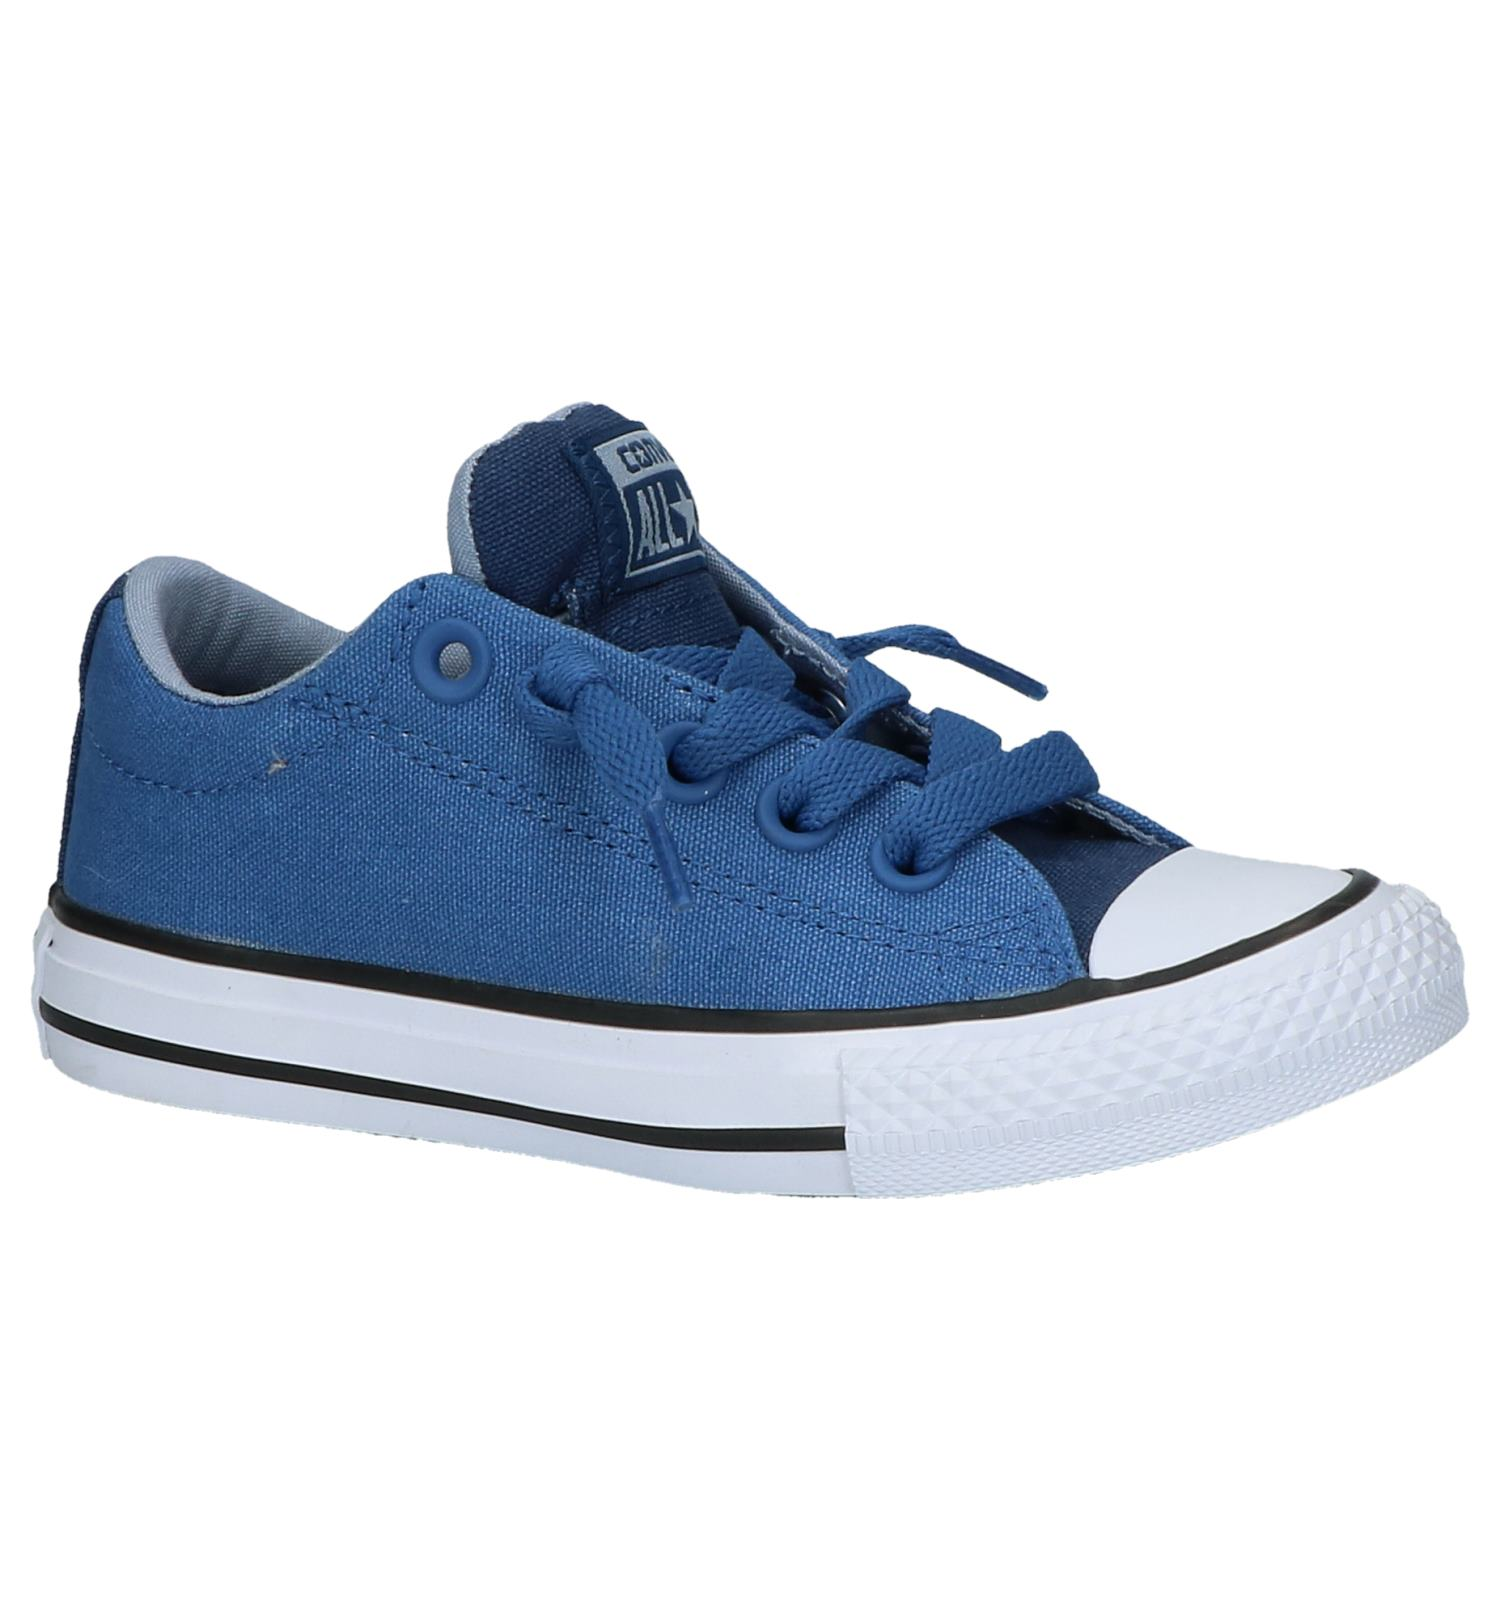 a6896467c96 Blauwe Lage Sportieve Sneakers Converse Chuck Taylor All Star Street |  TORFS.BE | Gratis verzend en retour